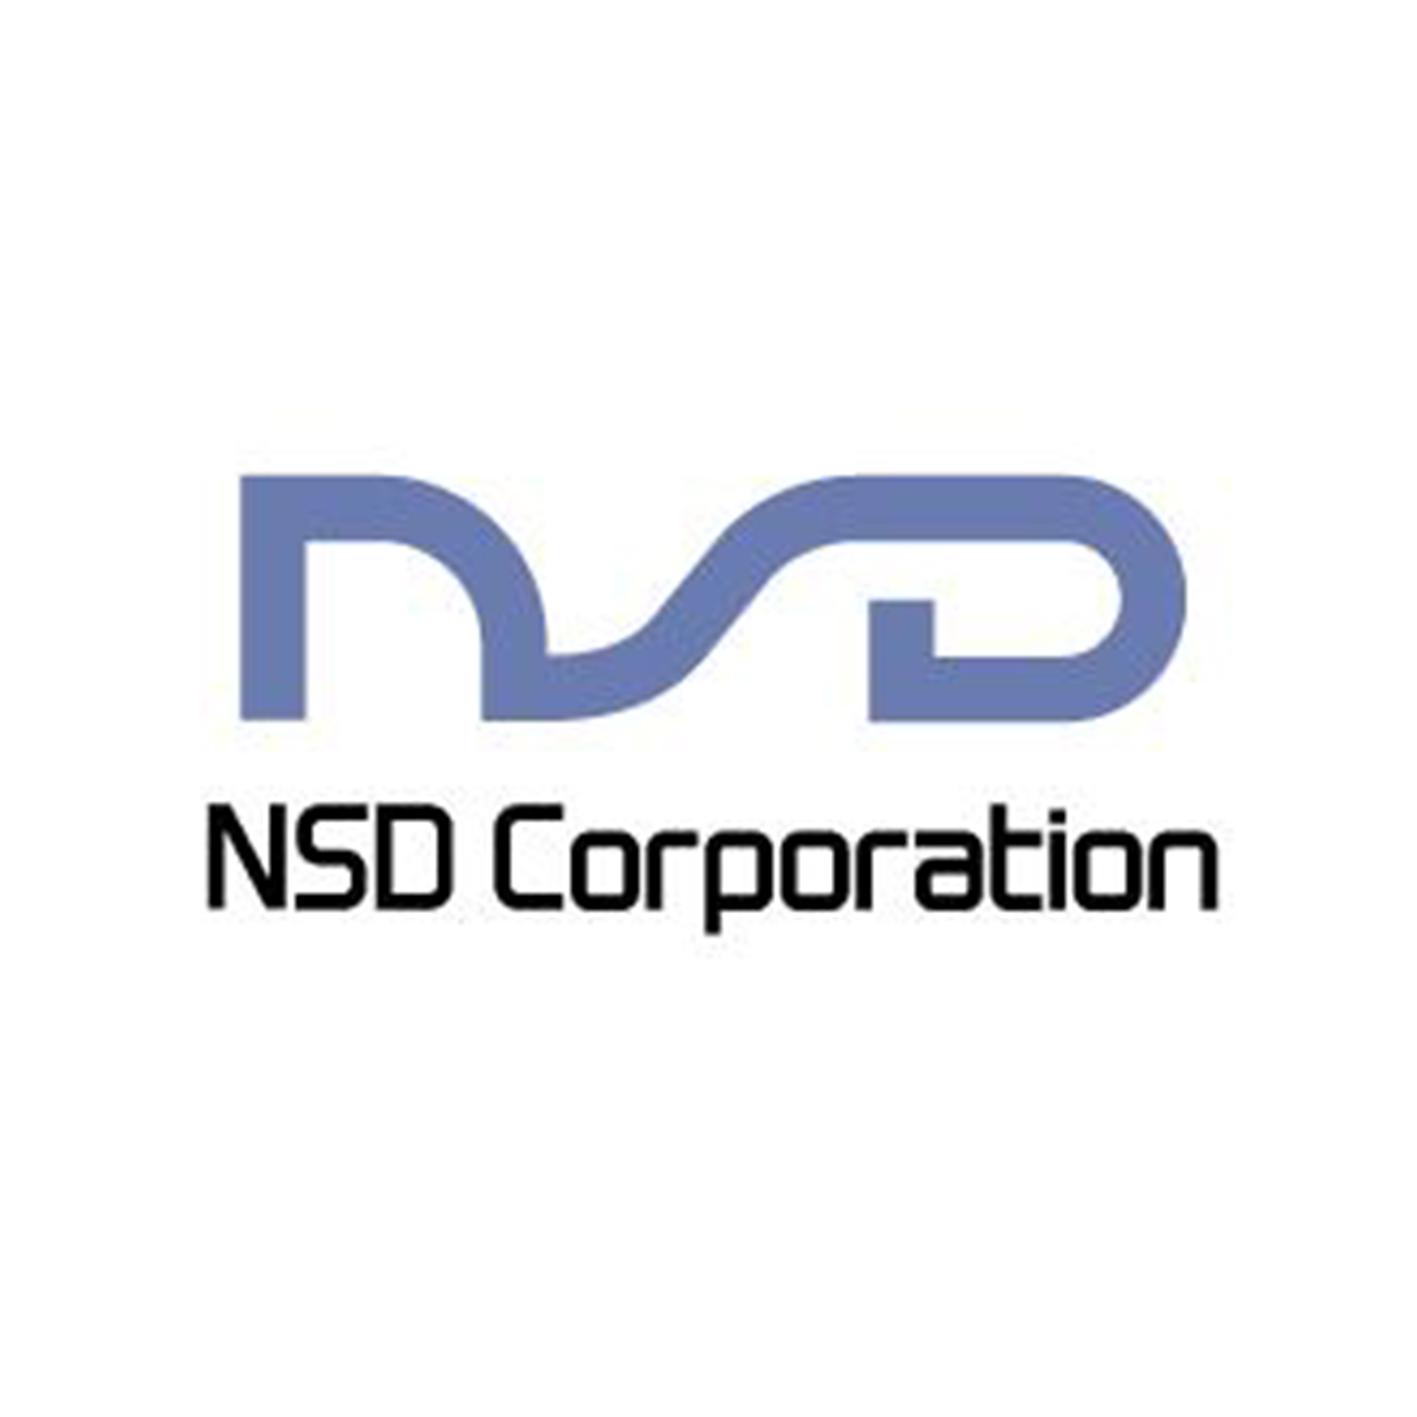 NSD Corporation